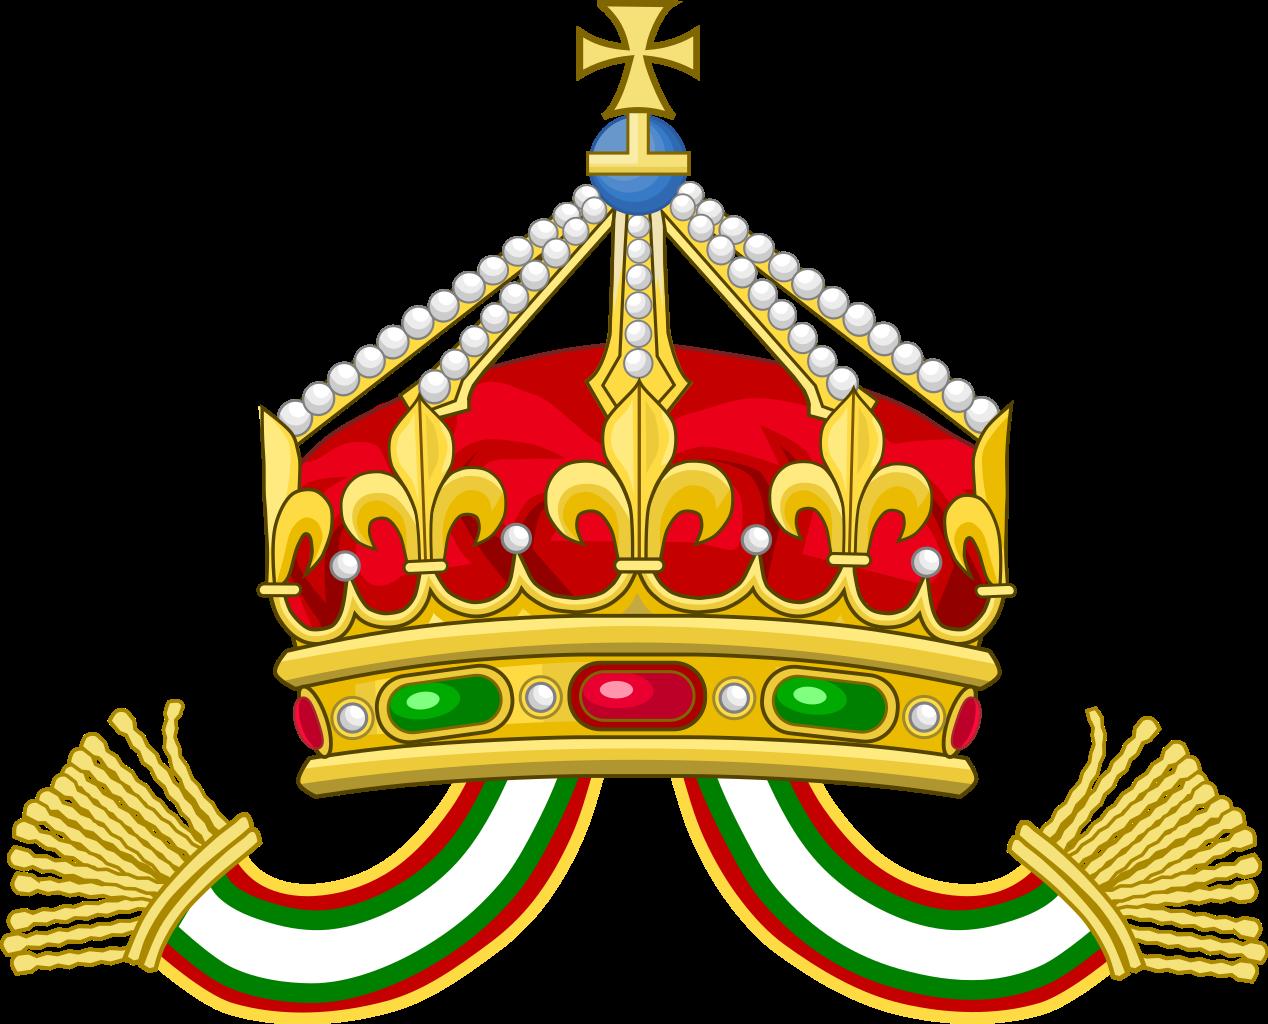 Couronne de bulgarie